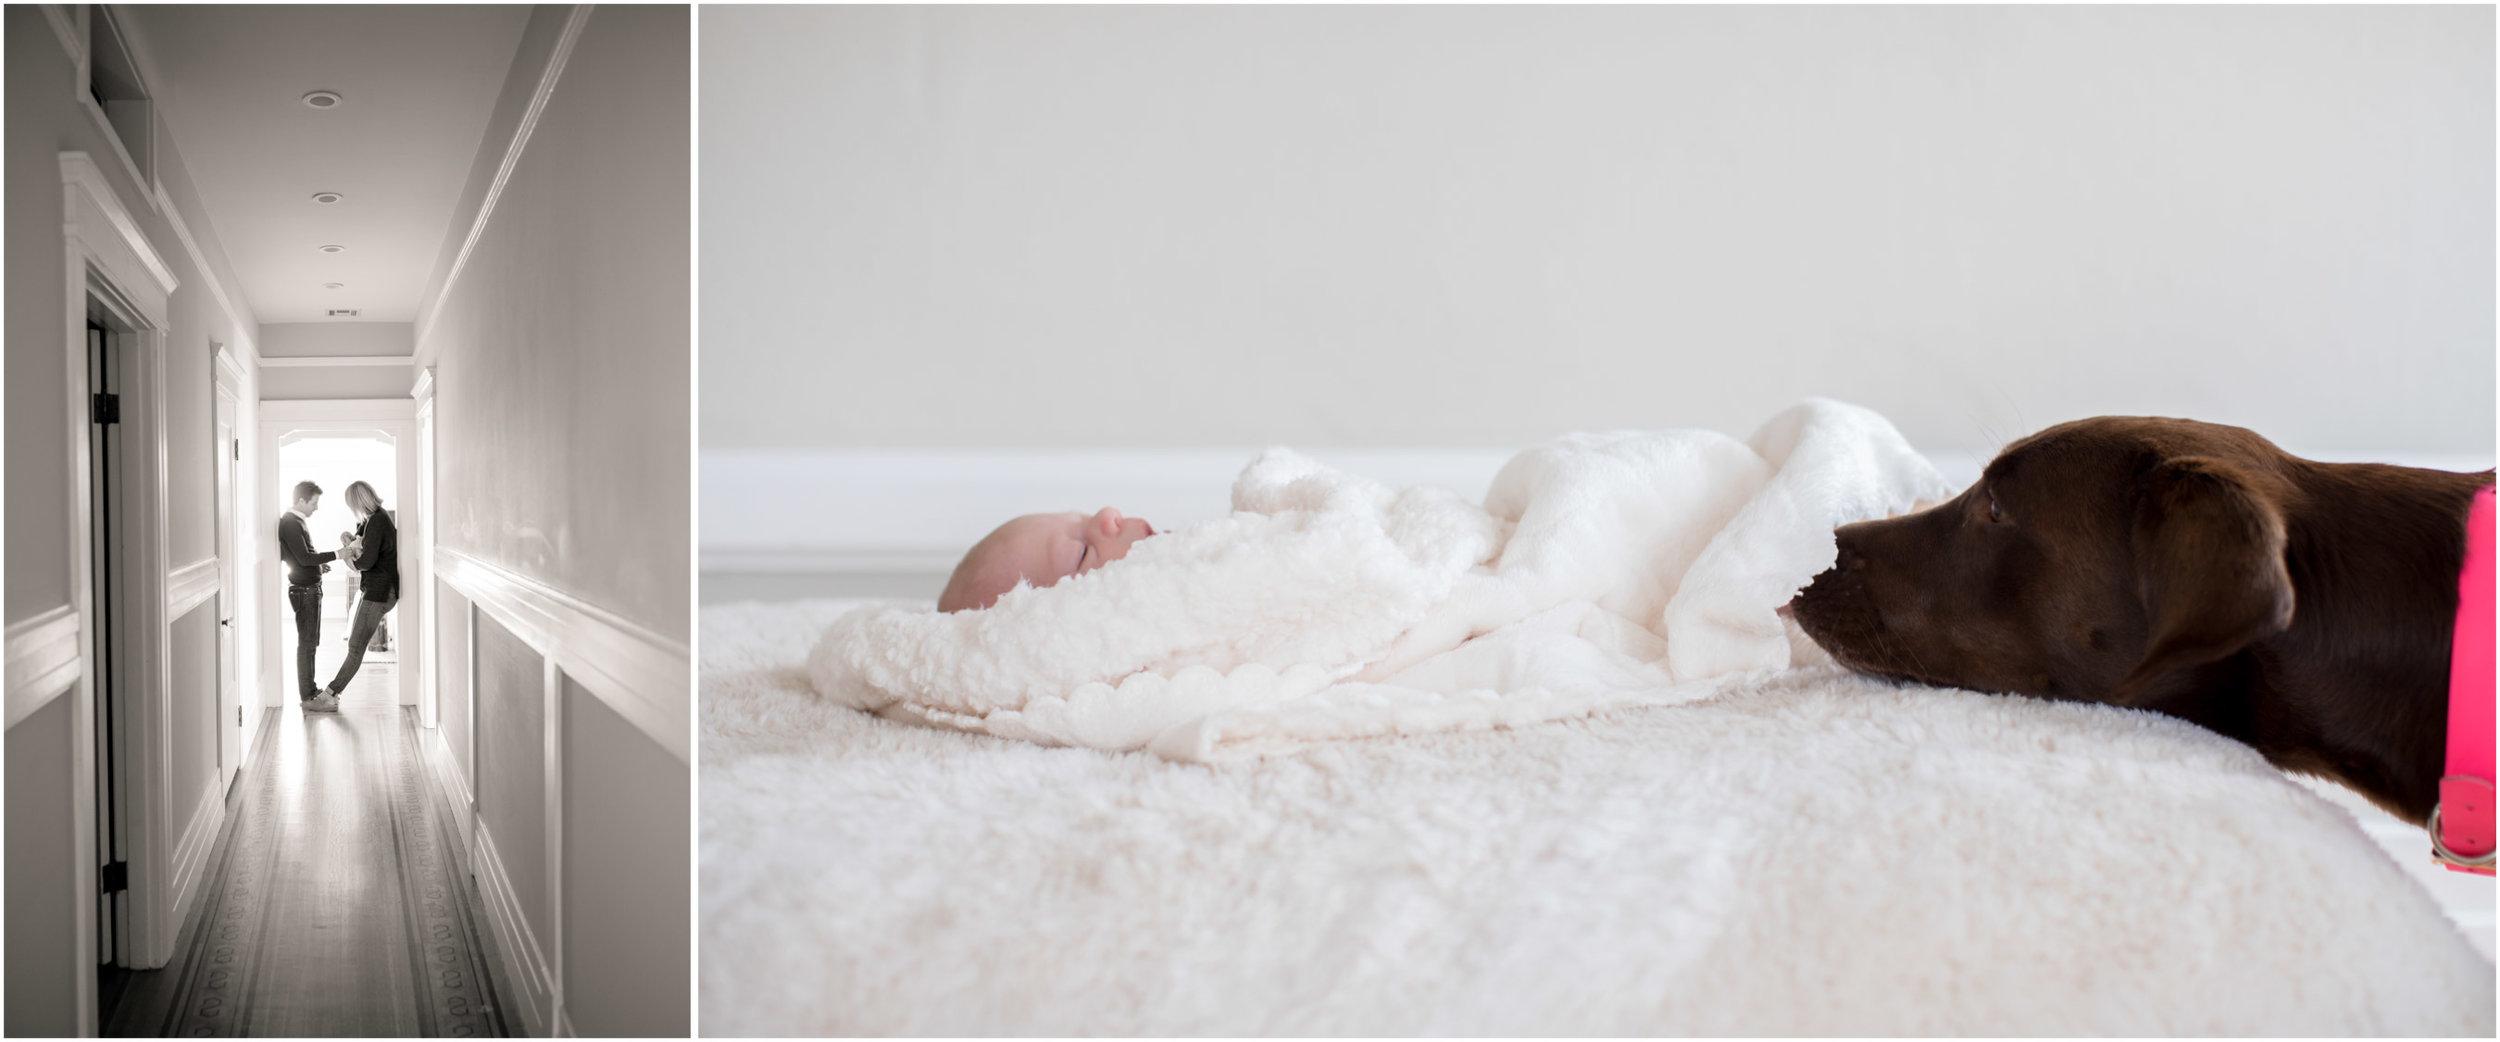 JennaBethPhotography-Annika-8.jpg